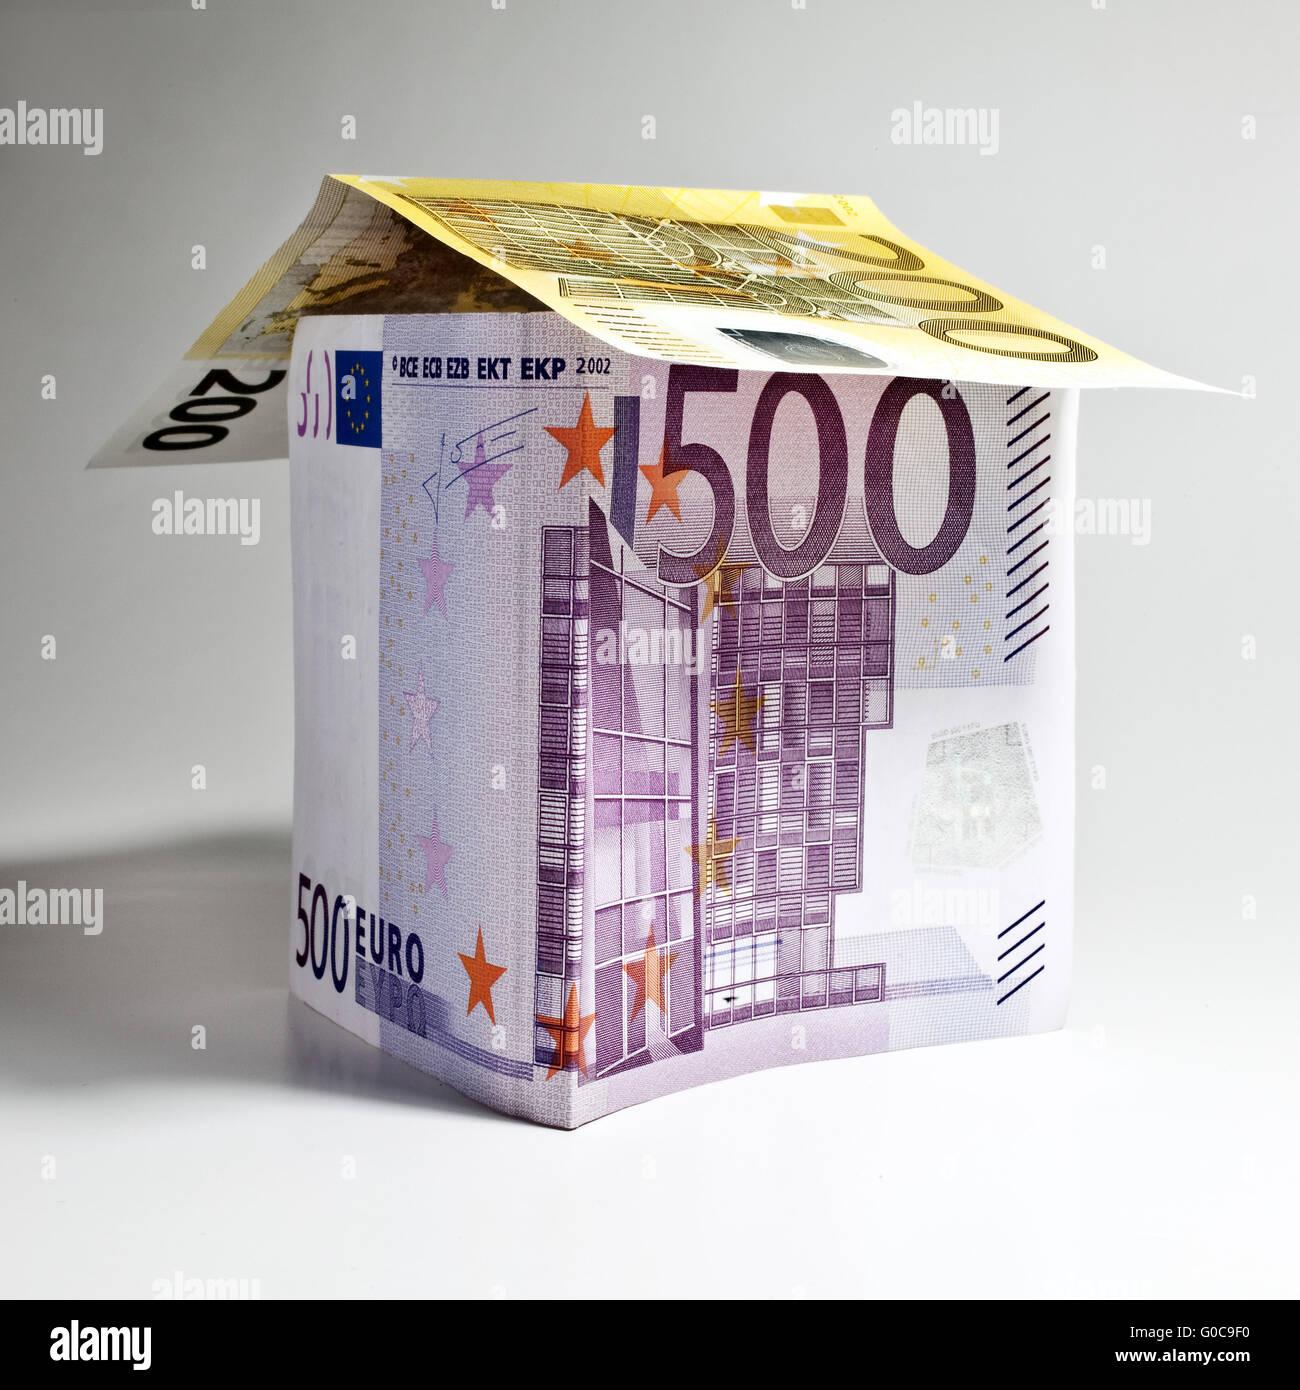 House made of euro banknotes, symbolic image - Stock Image